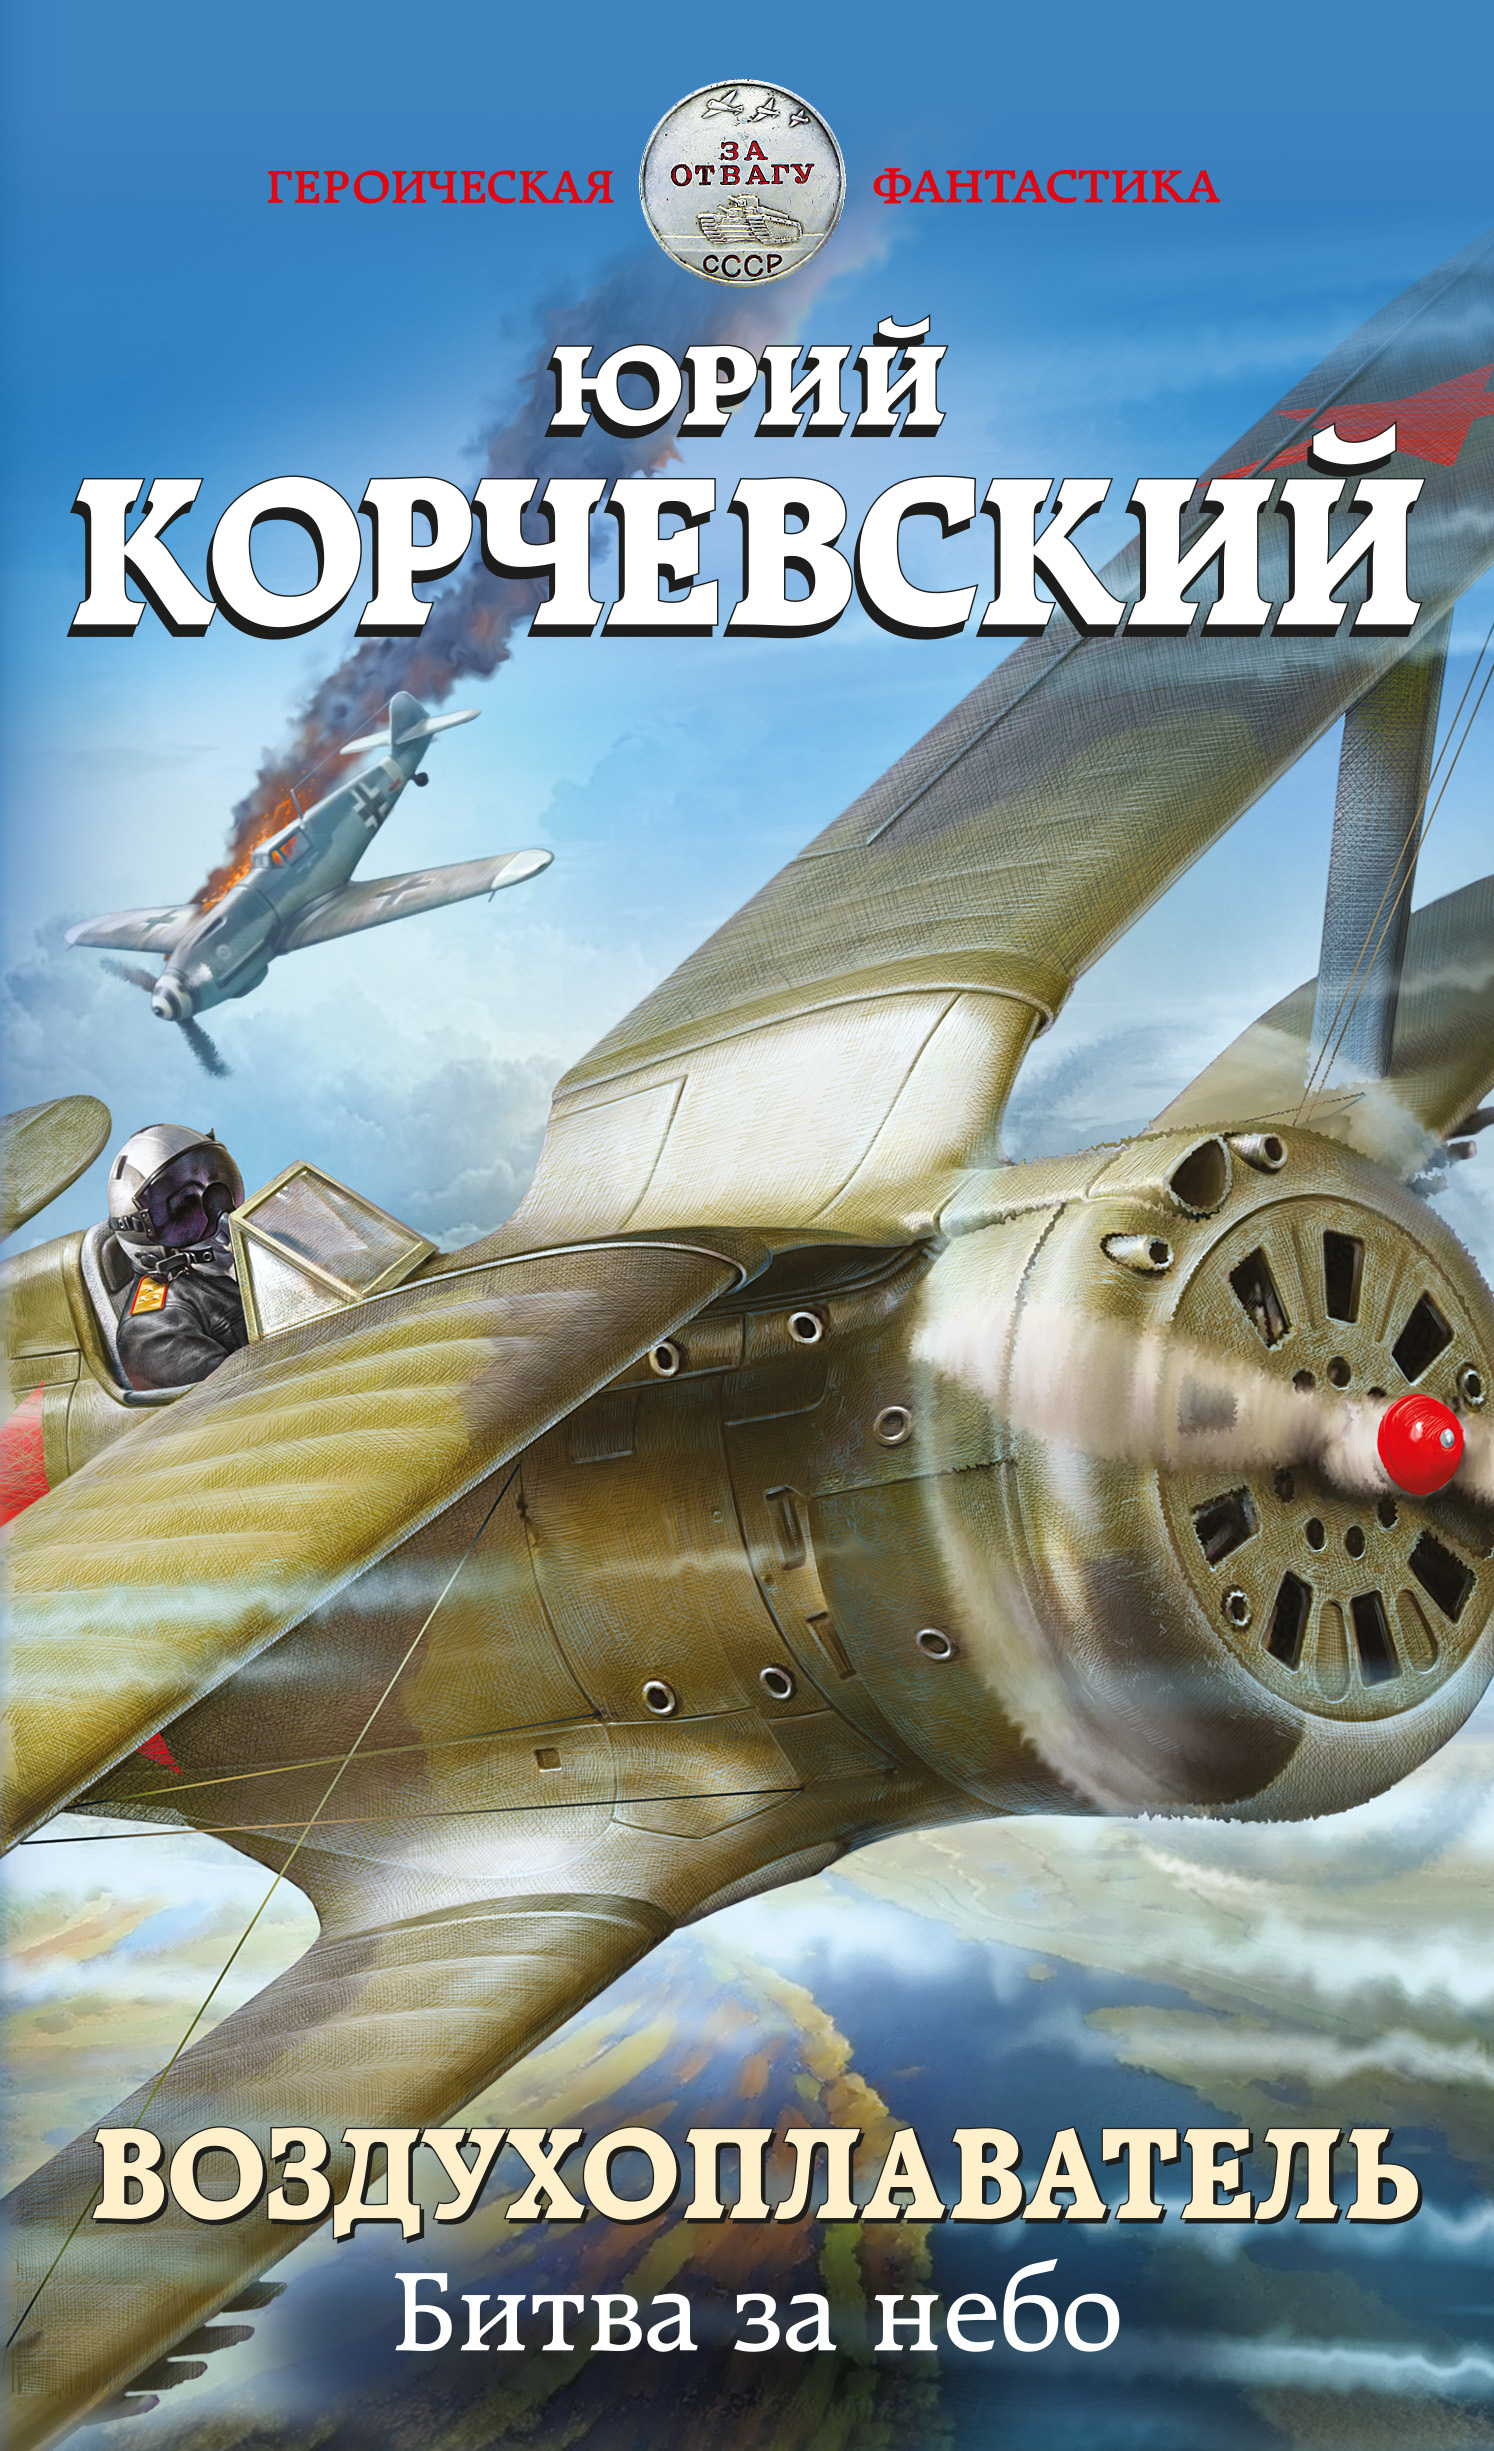 Юрий Корчевский - Воздухоплаватель. Битва за небо